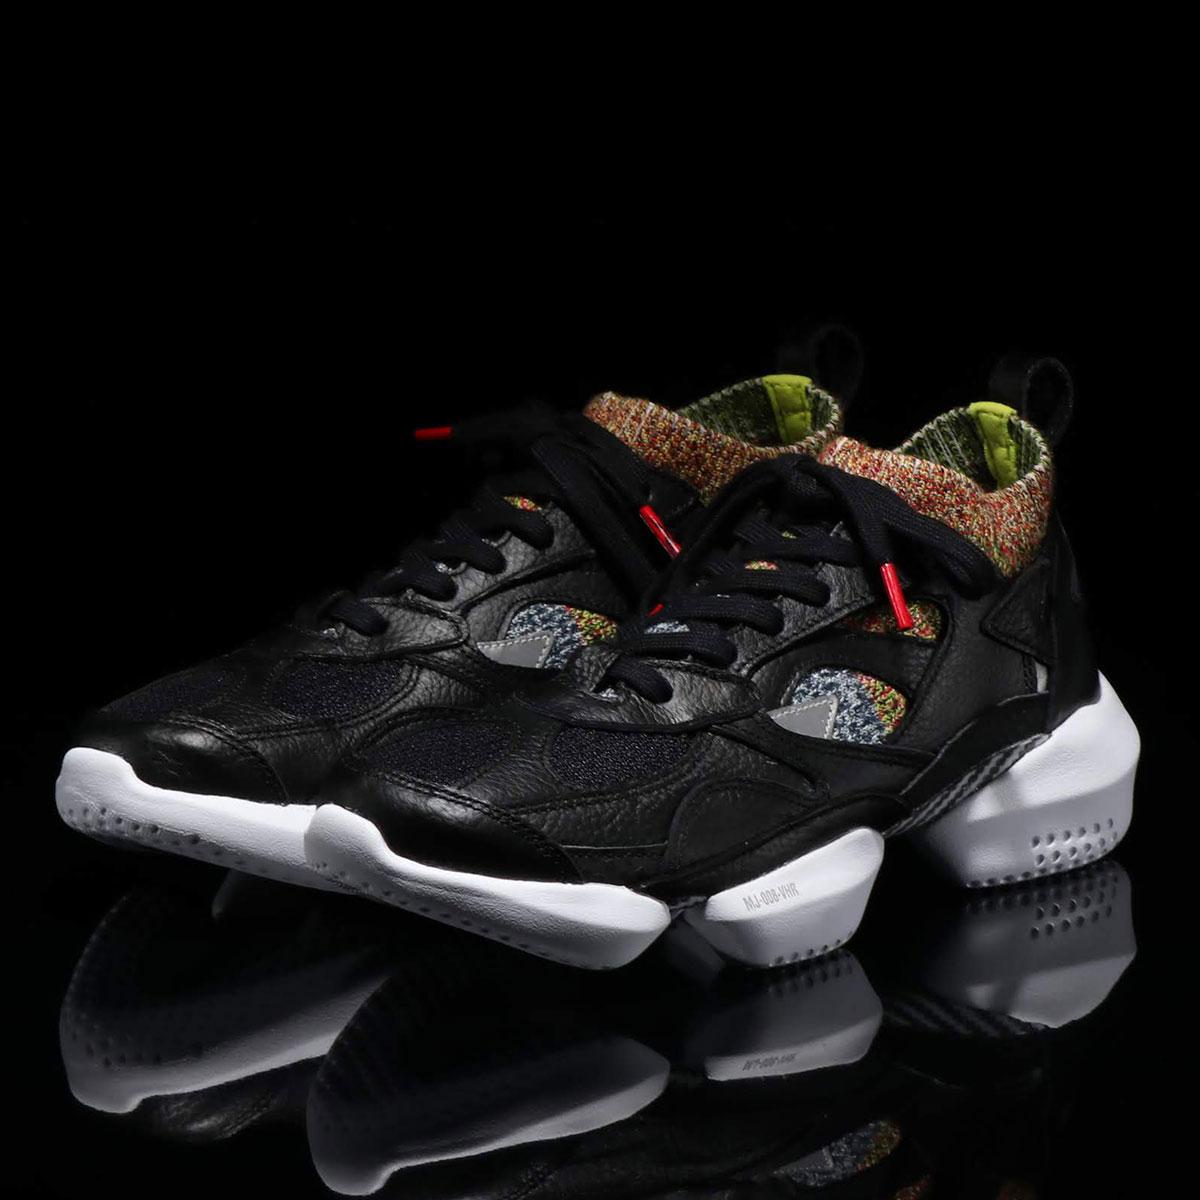 Reebok Classic 3D OP Pro Black Hypergreen White Men Fashion New Sneakers CN3956